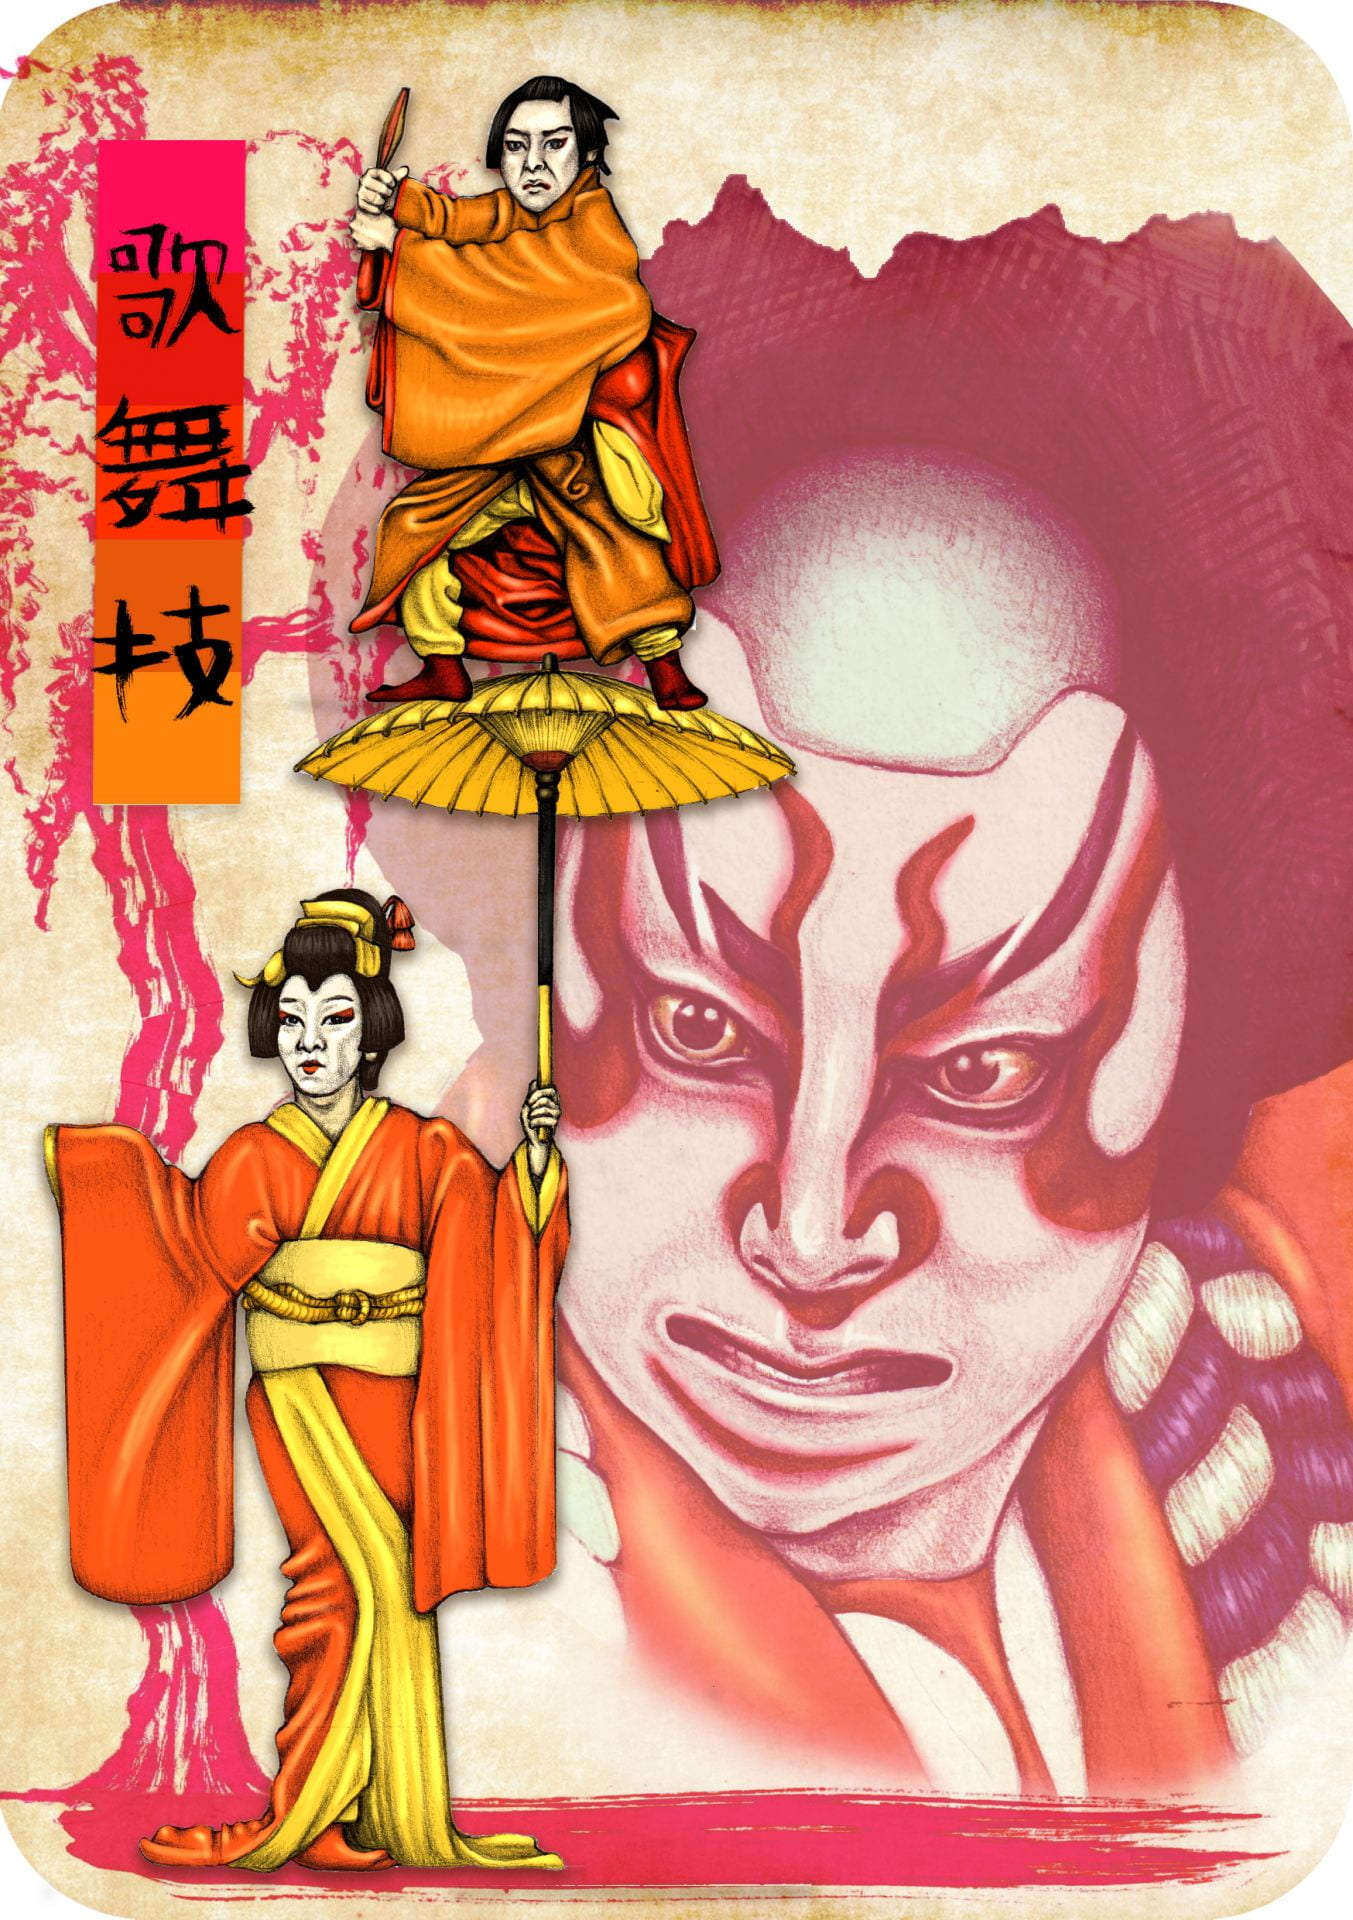 Visual experimentation exploring Kabuki Theatre and Geishas.